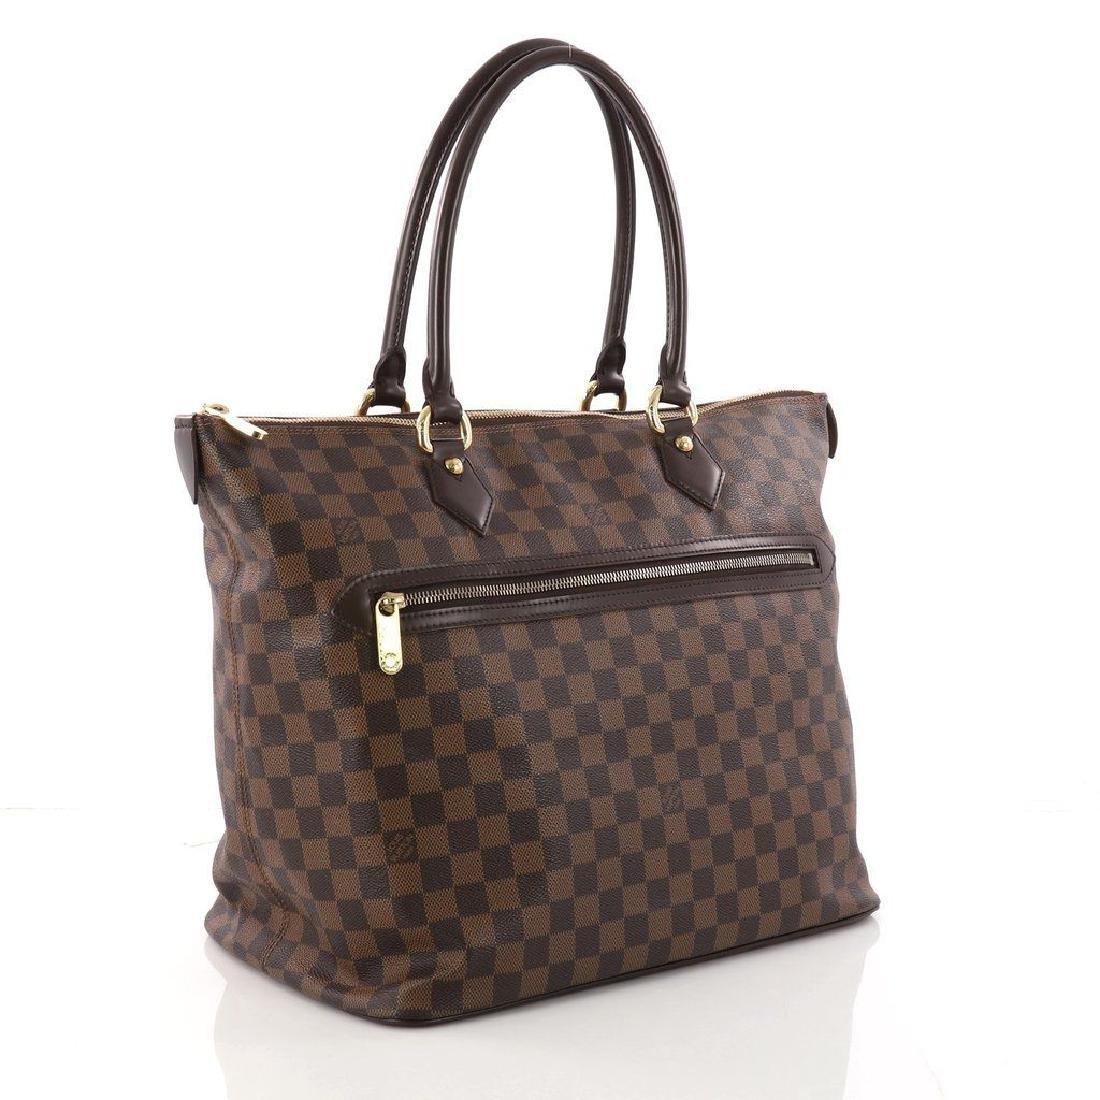 Louis Vuitton Damier Ebene Saleya GM Tote Shoulder Bag